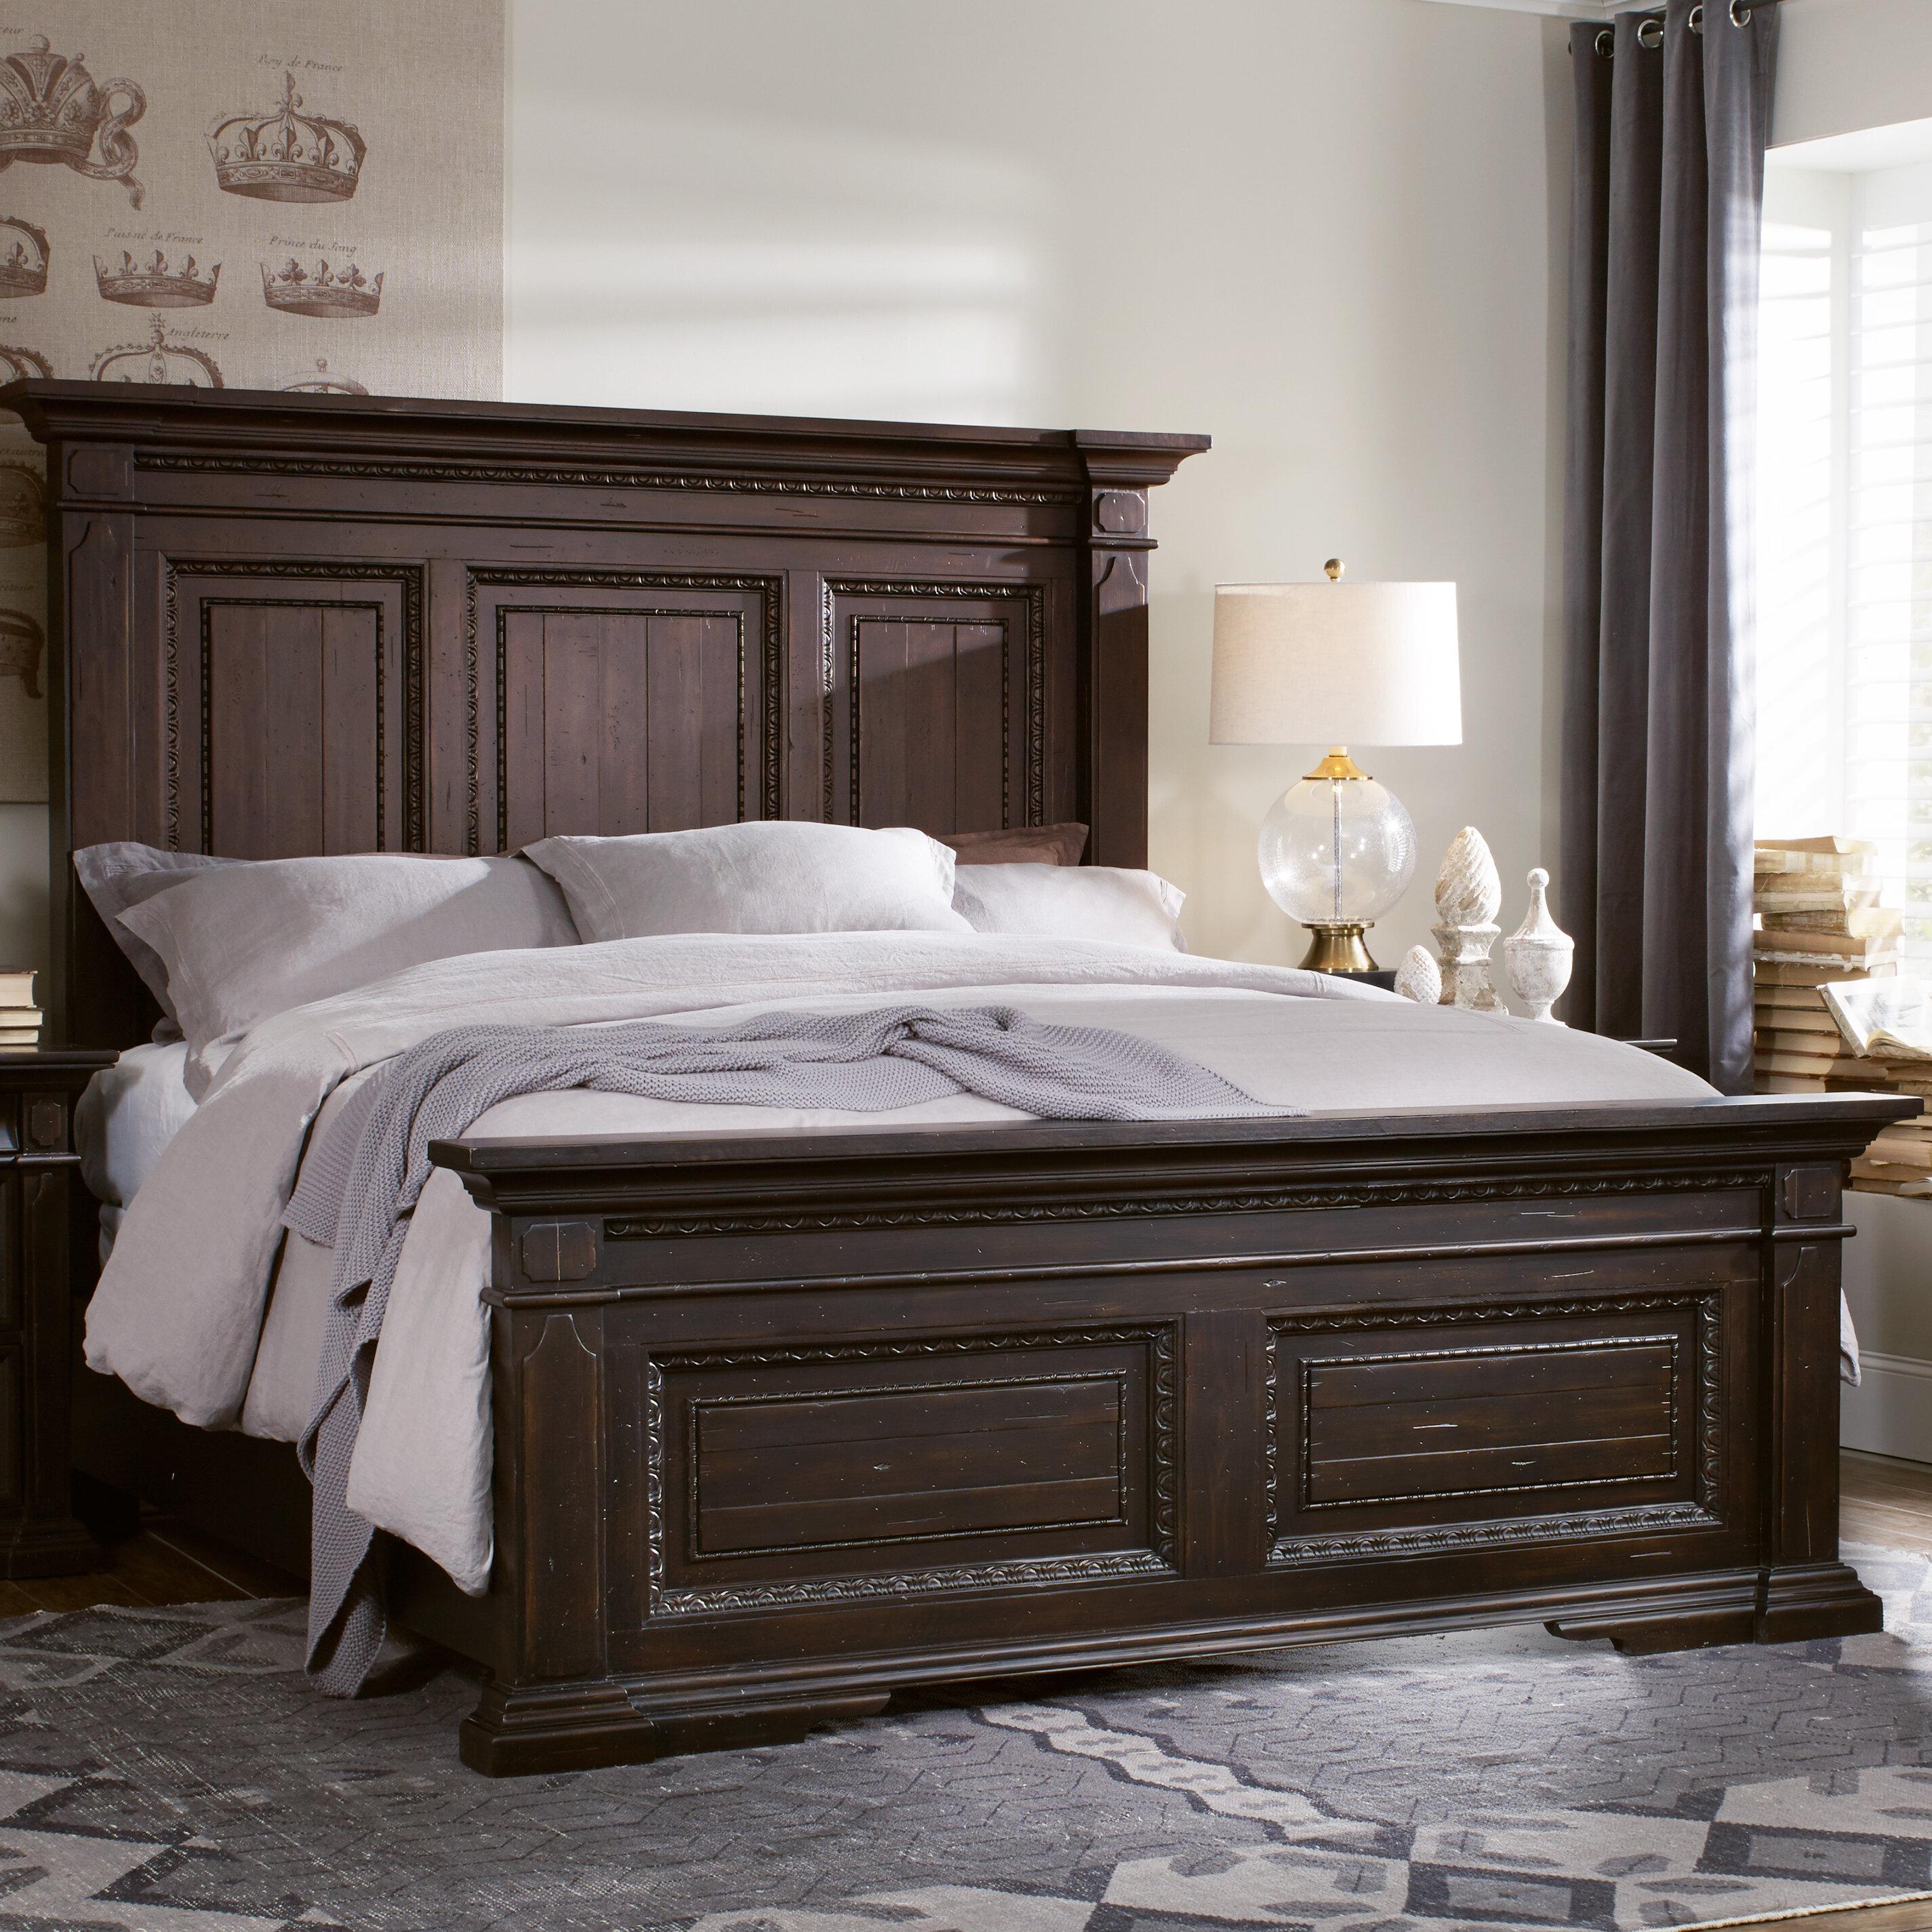 e26f797e053 Hooker Furniture Treviso Panel Bed   Reviews